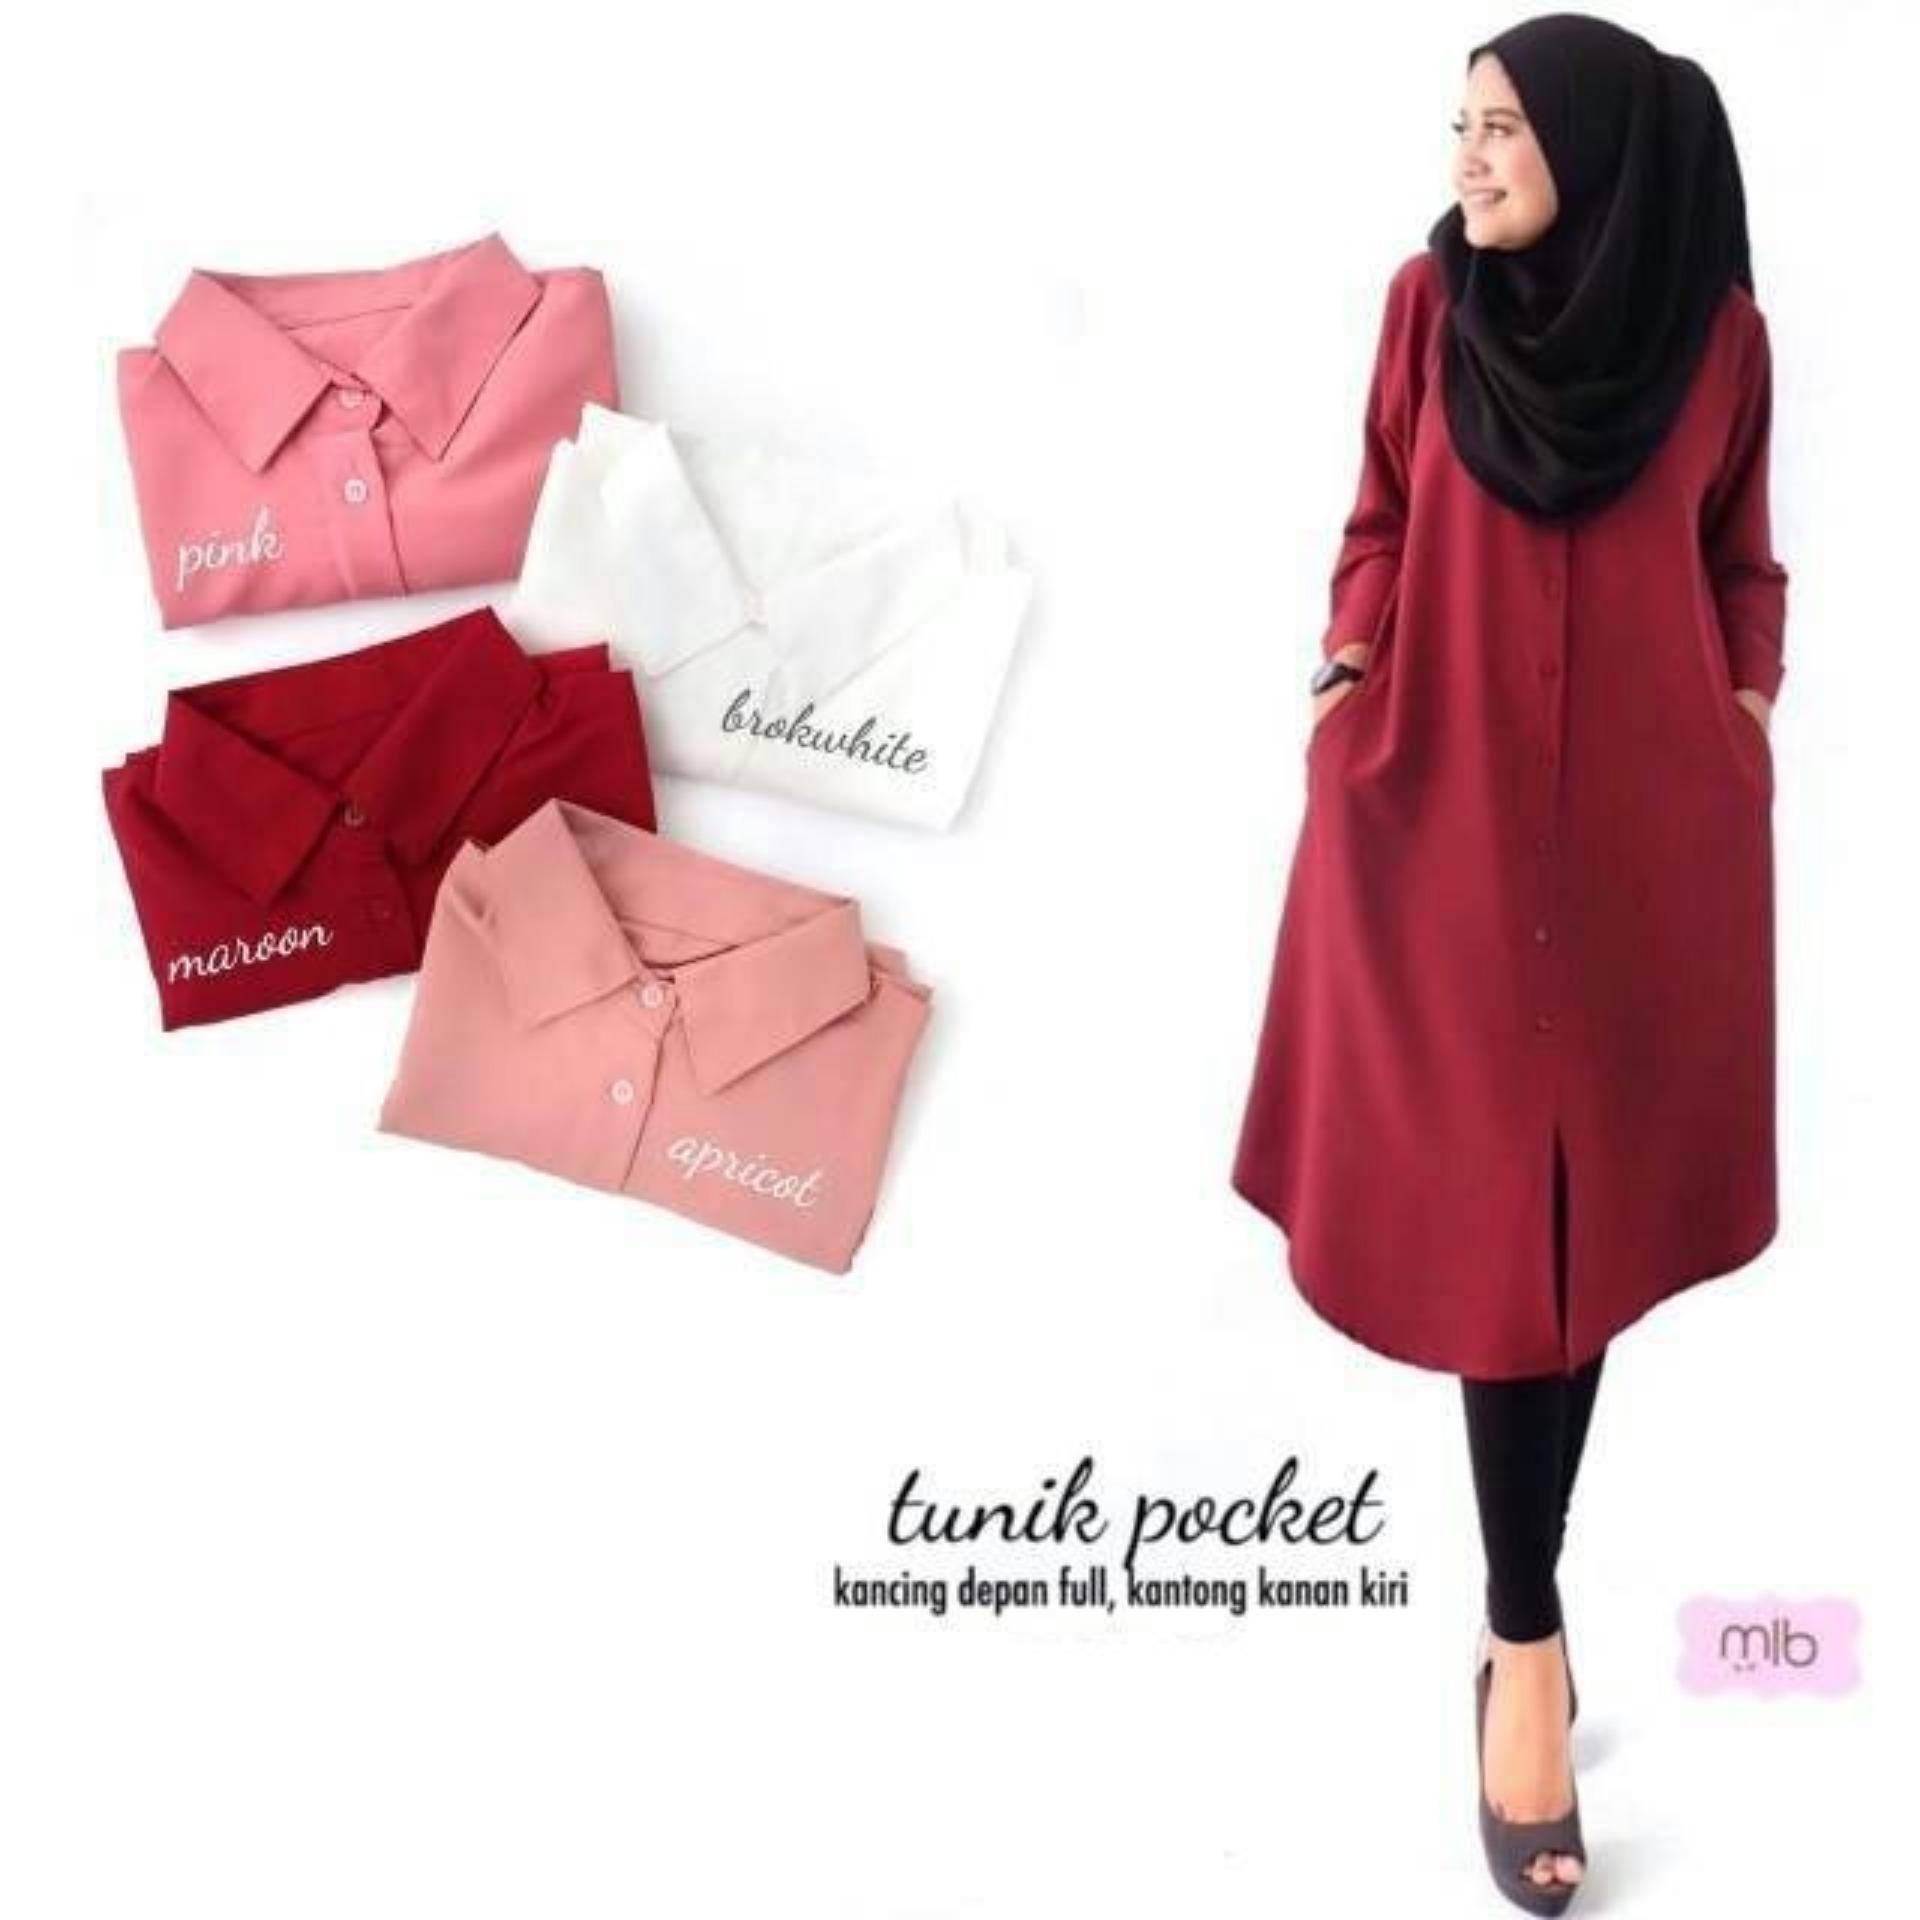 Buy Sell Cheapest Koko Gamis Best Quality Product Deals Baju Syarii Busana Muslim Pria Dnyh Shop Tunik Pocket Red Kemejaet Dress Atasan Wanita